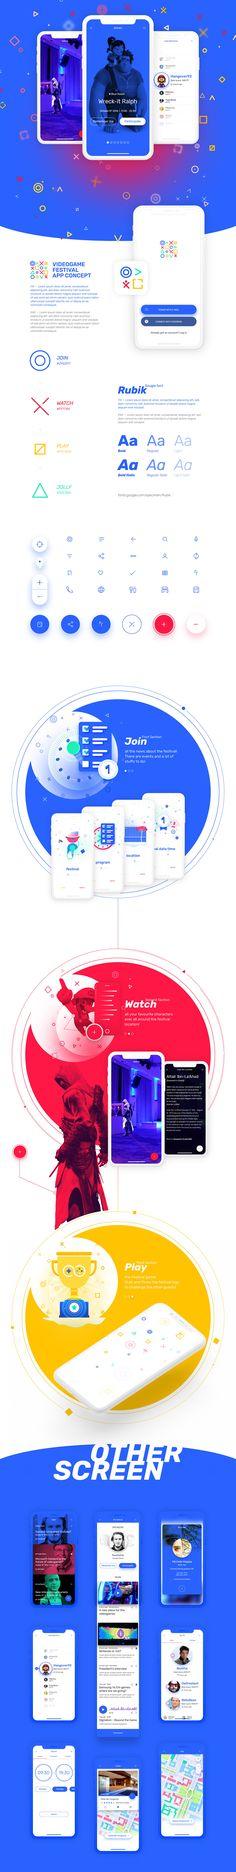 "Vedi il mio progetto @Behance: ""Videogame Festival - App Concept"" https://www.behance.net/gallery/4606709/Videogame-Festival-App-Concept"